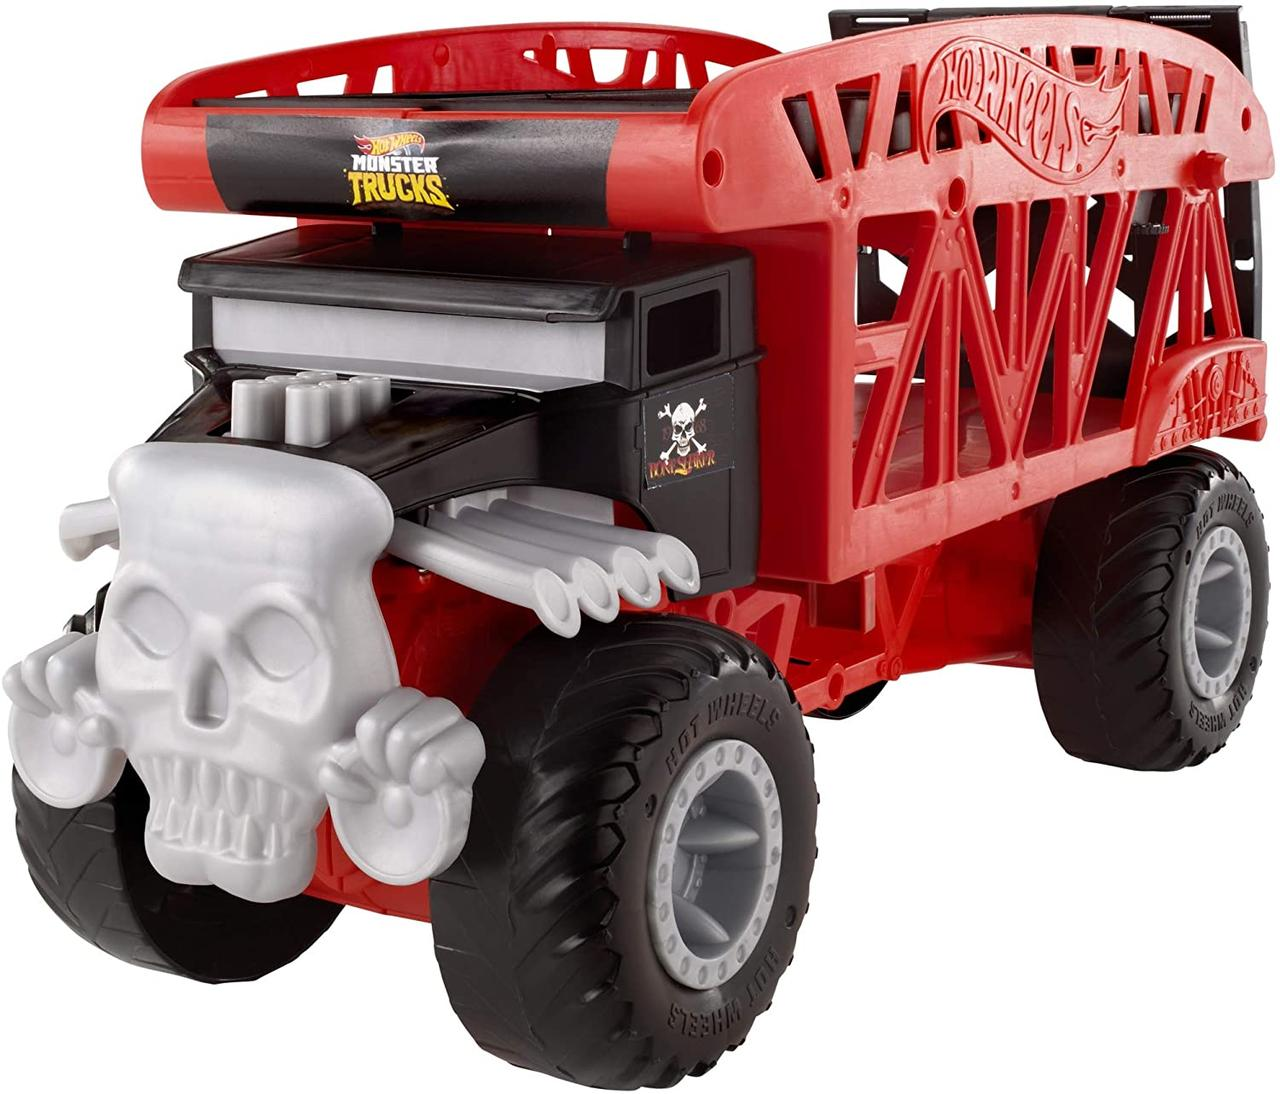 Хот Вилс Монстро-транспортер на 12 машинок Монстр Трак автовоз перевозчик Hot Wheels Monster Truck